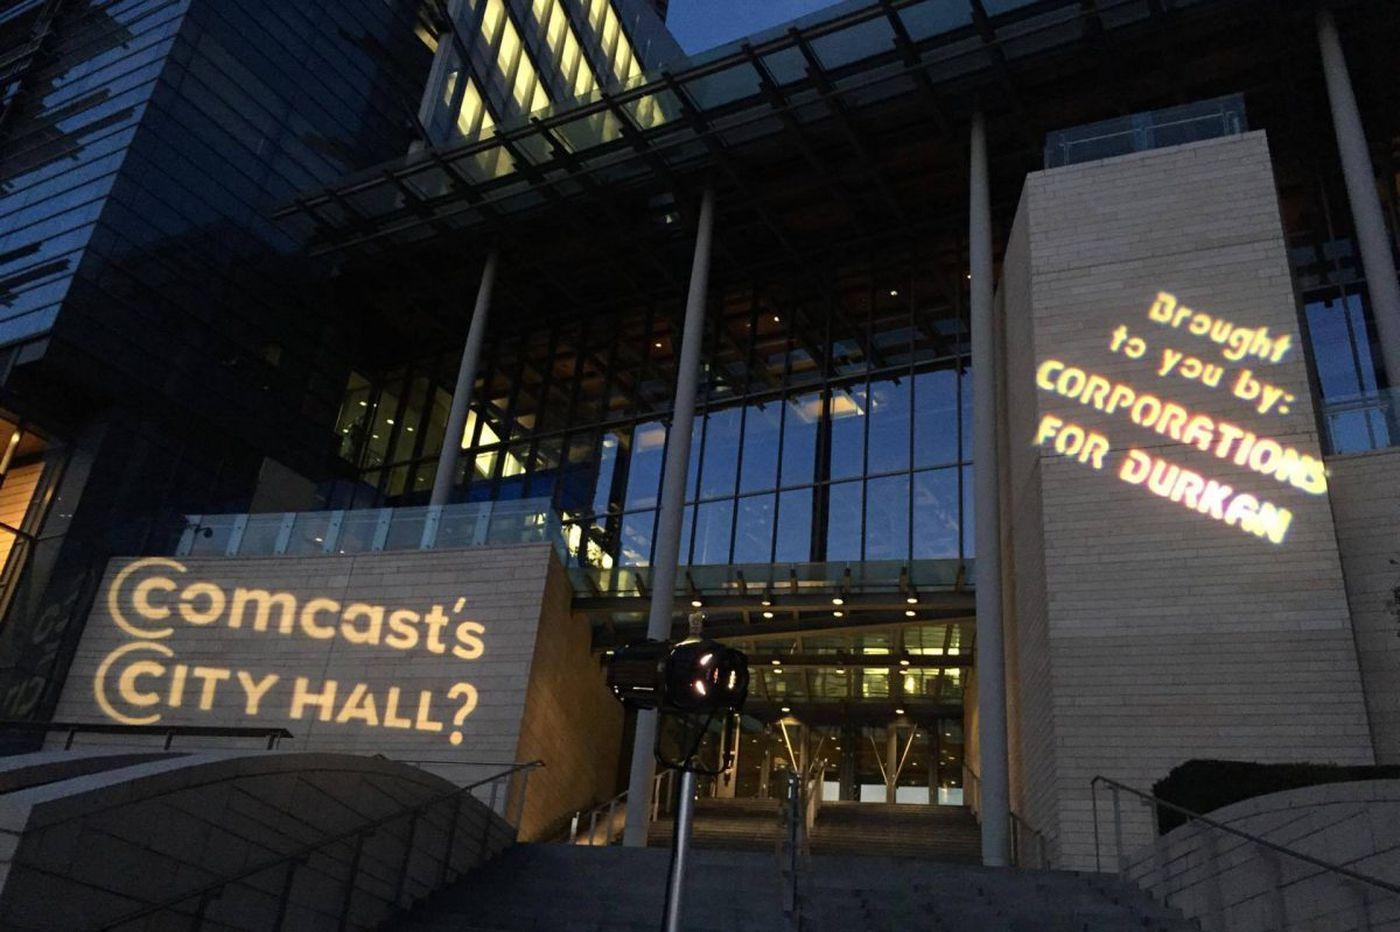 Activists target Comcast over municipal broadband in Seattle, Colorado